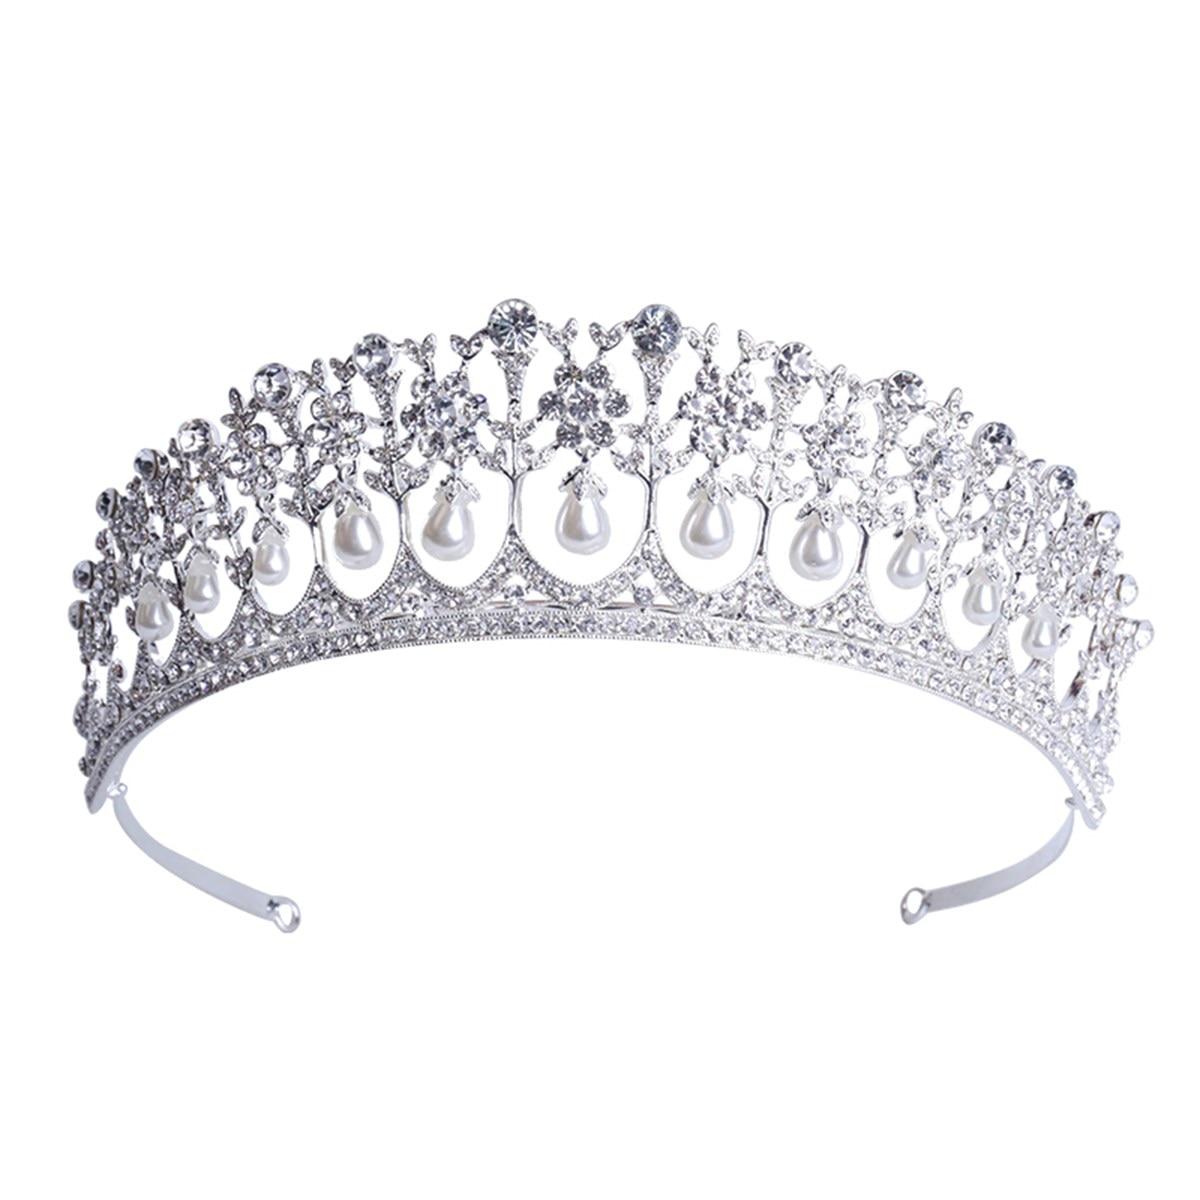 Women Vintage Wedding Bridal Tiara Crystal Pearl Crown Princess Hair Accessories Jewelry Headpiece Rhinestone Bride Headband